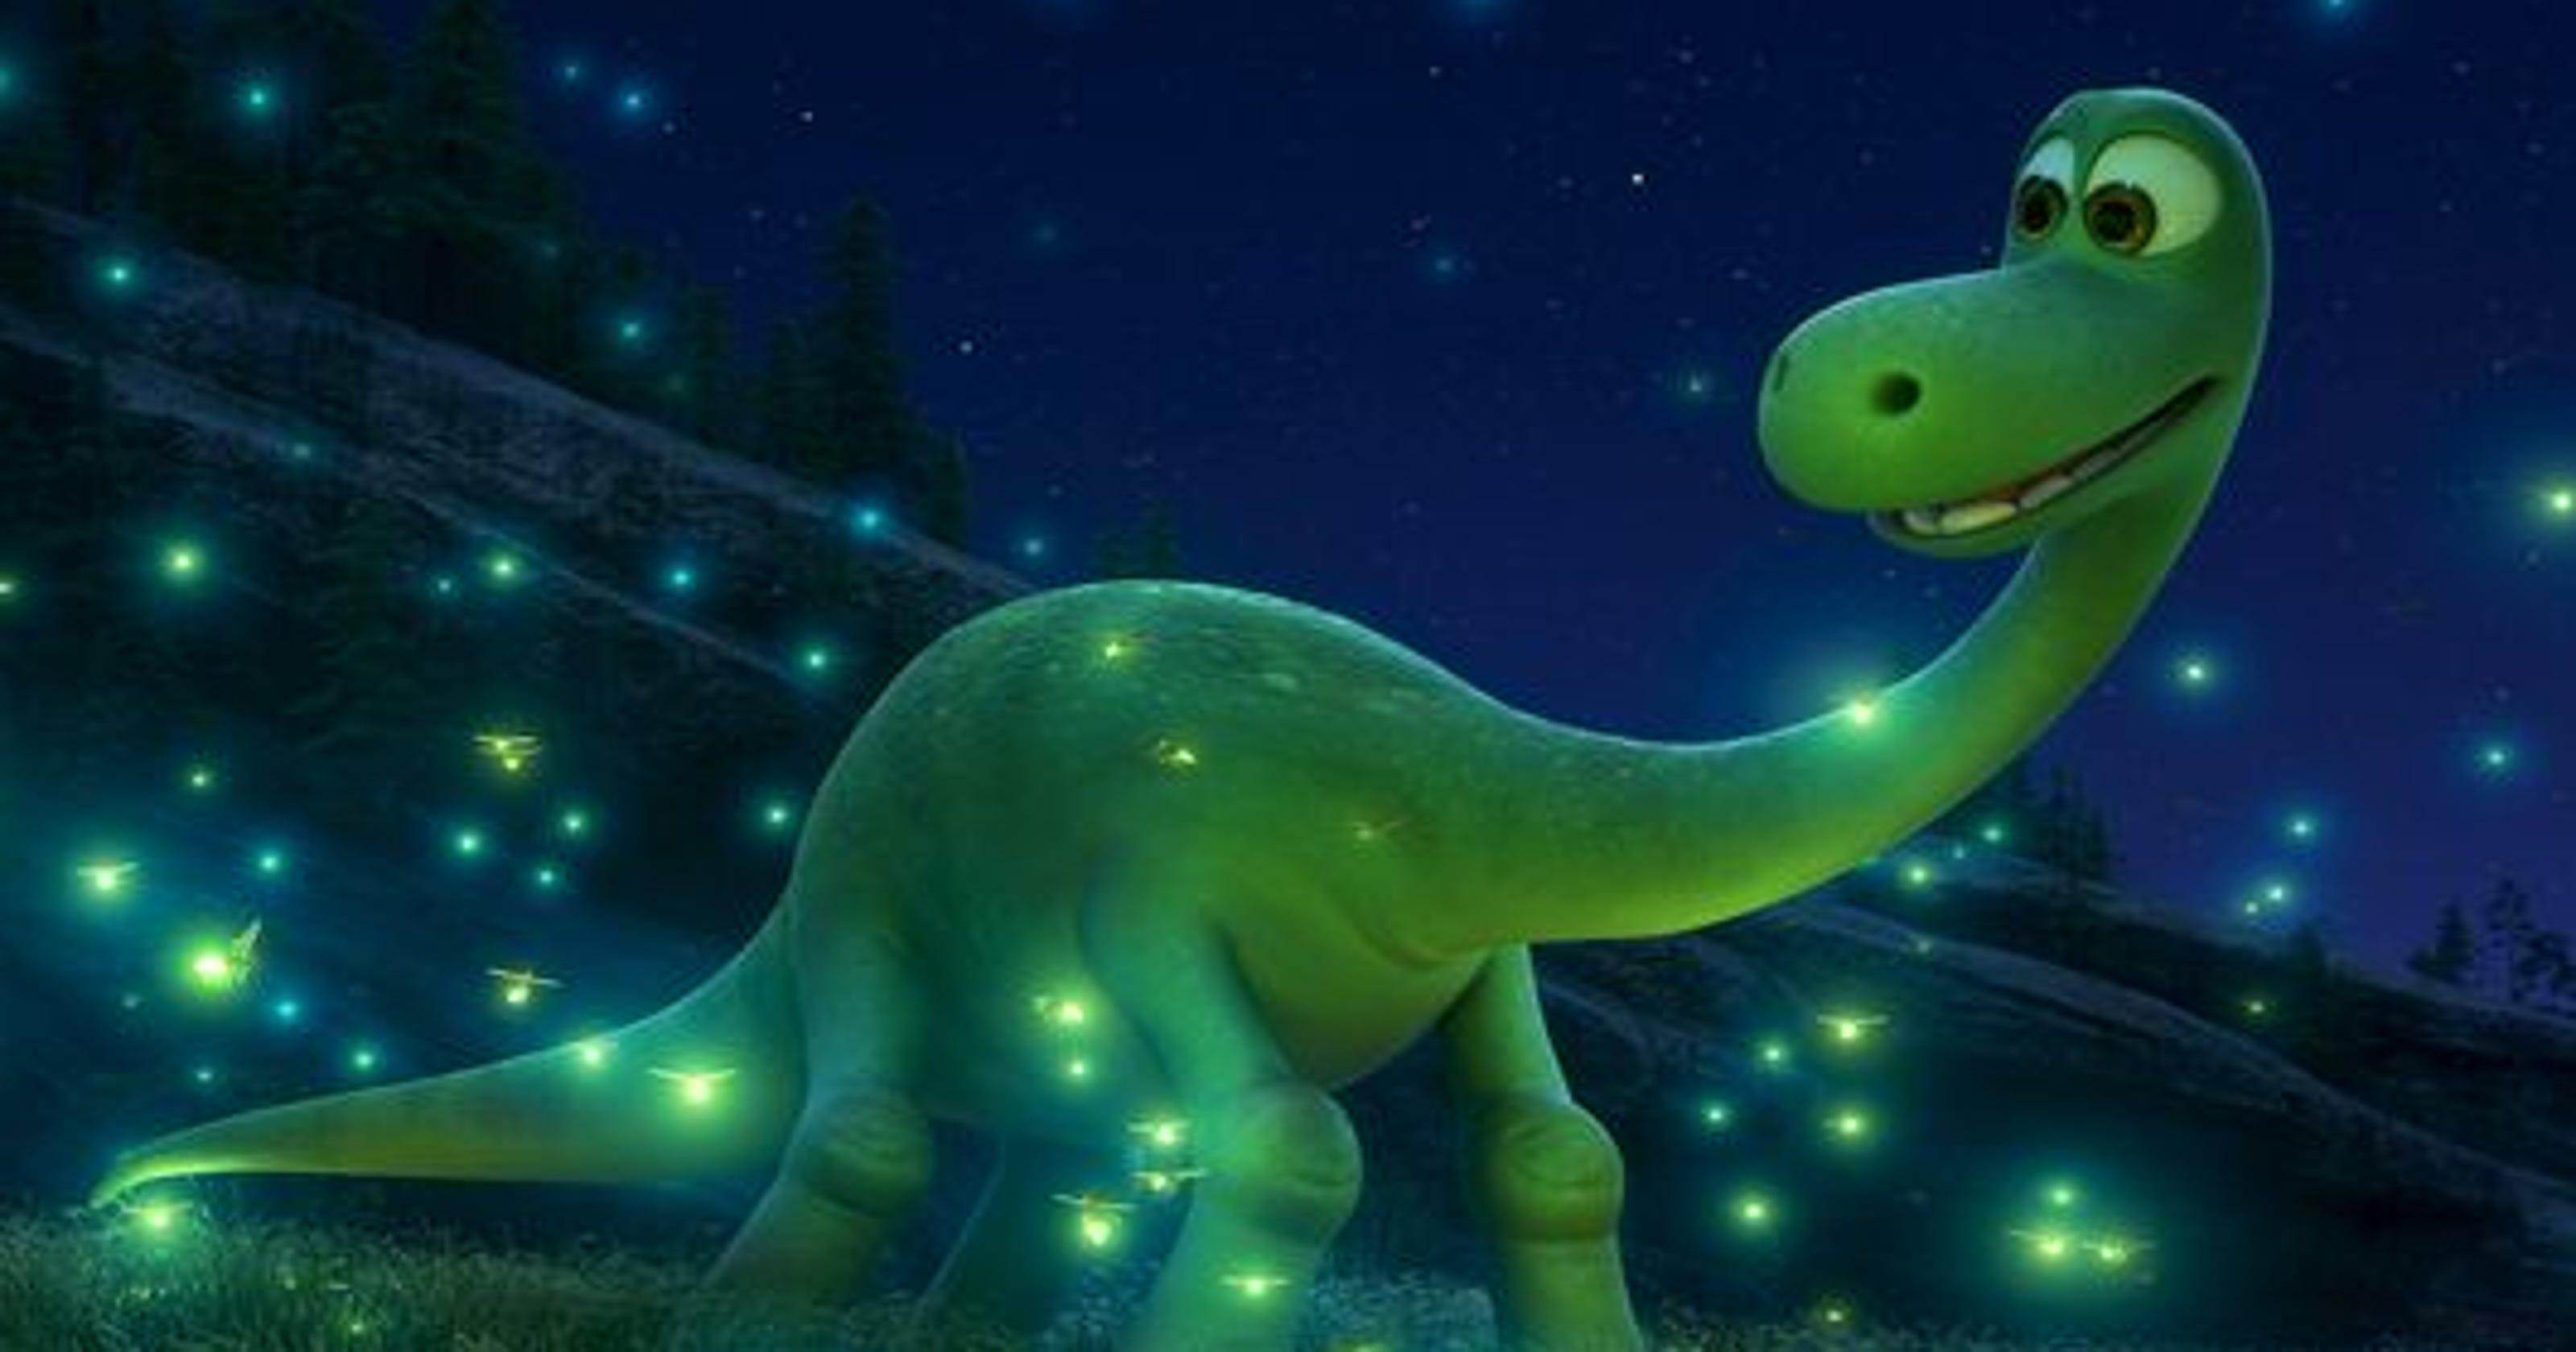 the good dinosaur full movie in hindi download hd 720p